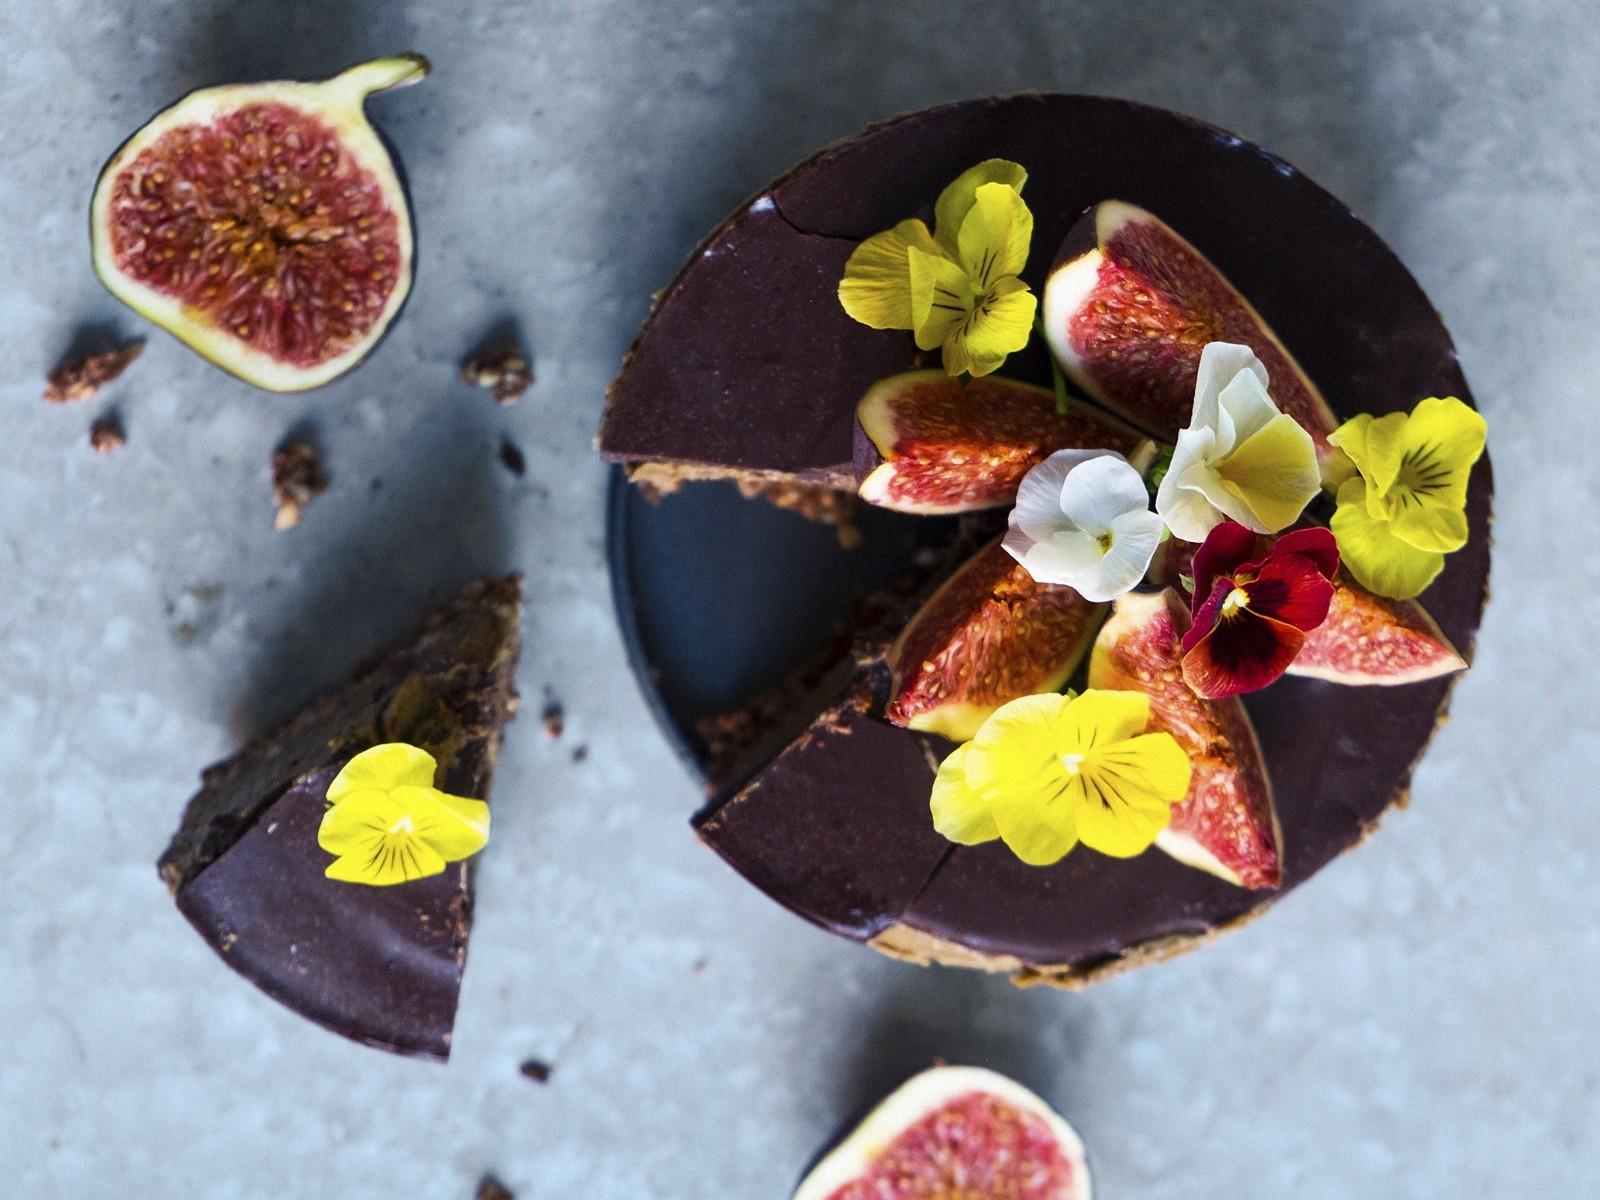 nyttig raw food choklad tårta recept.jpg